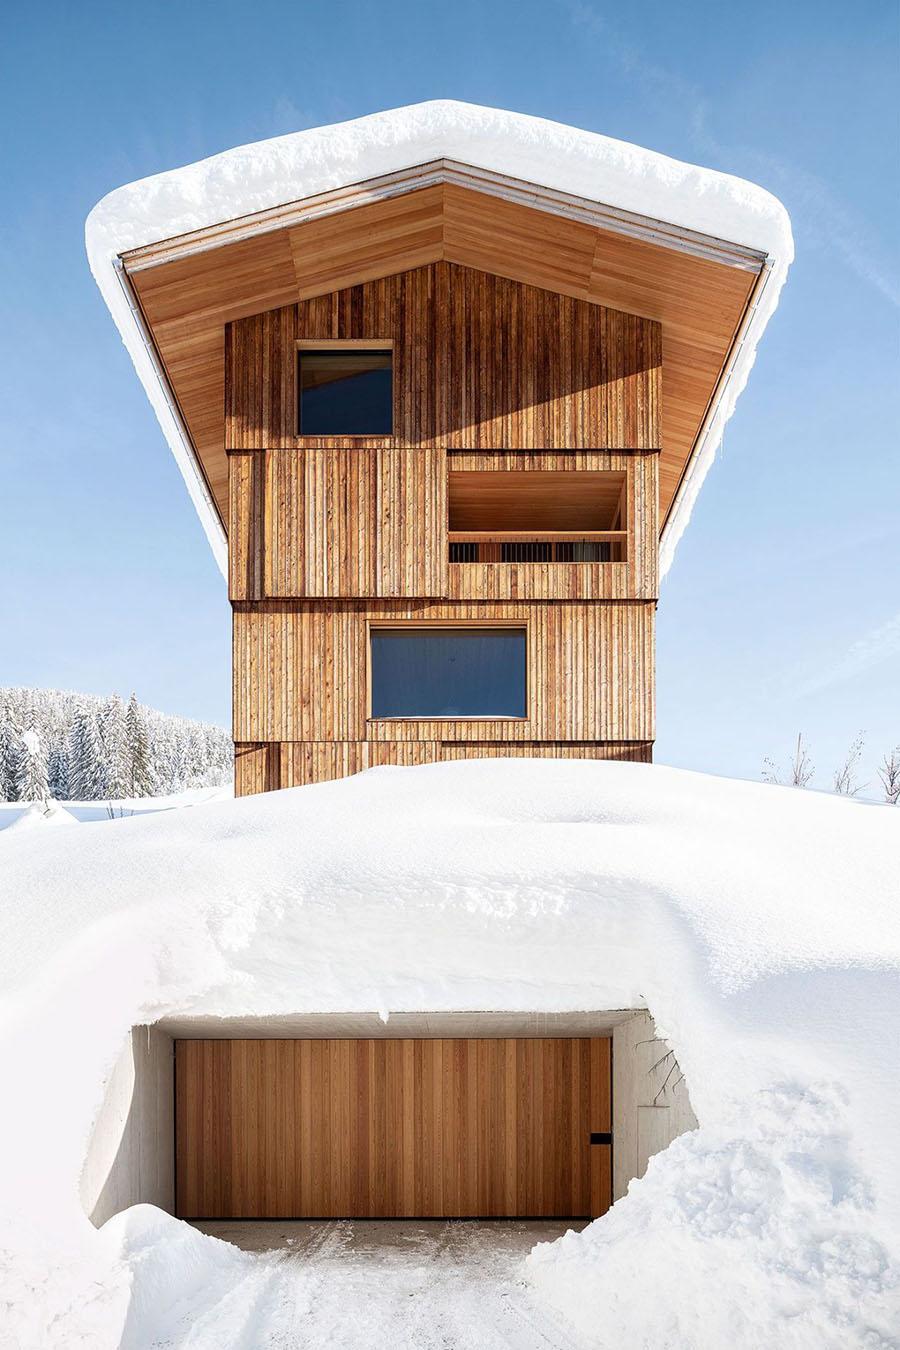 Turmhaus Tirol by Grünecker Reichelt + Holzrausch